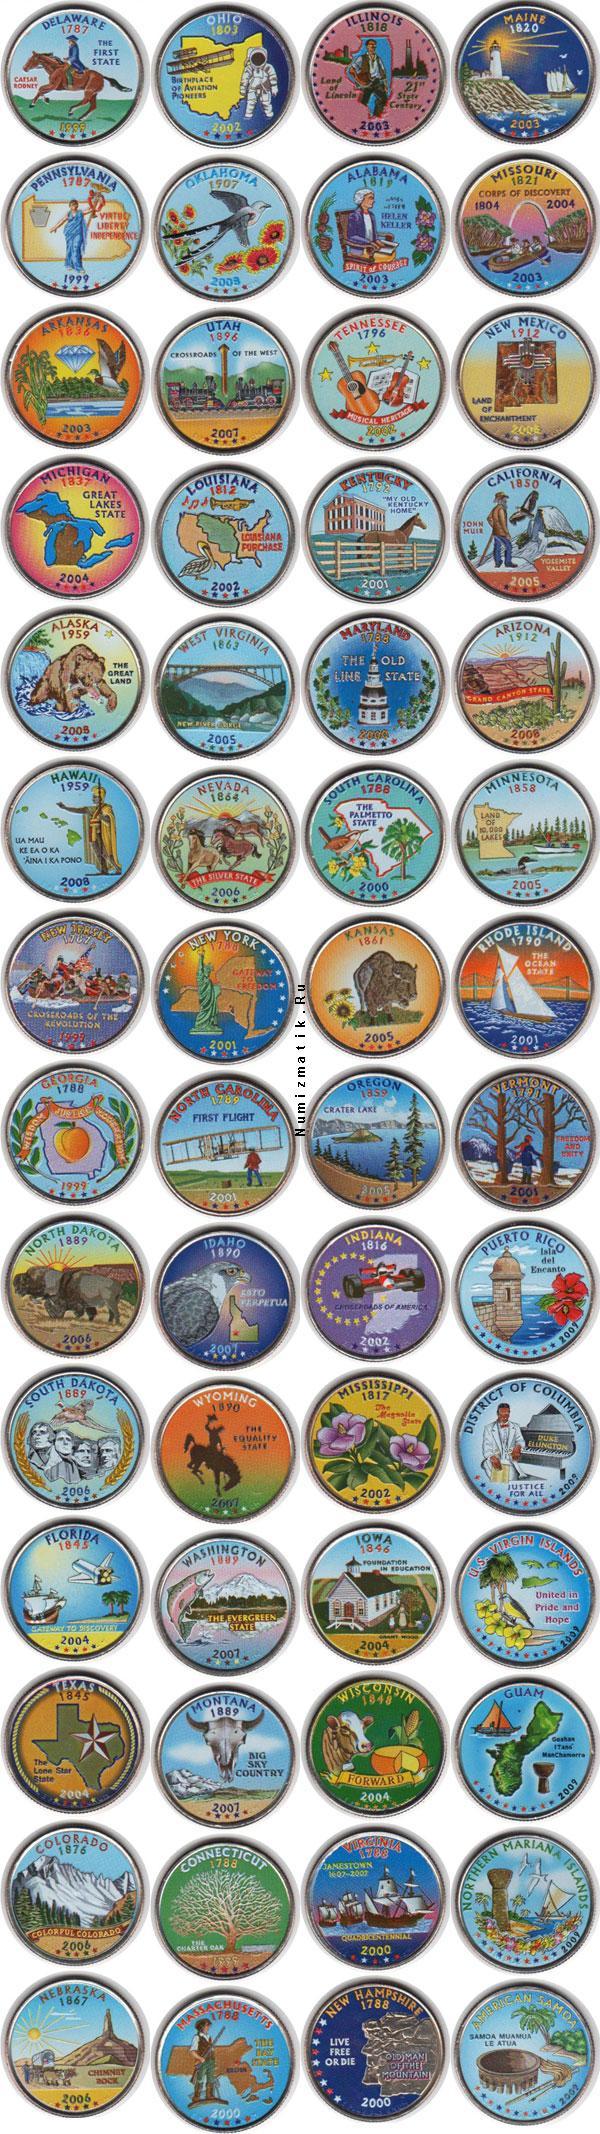 Каталог монет - США США 1999-2009гг